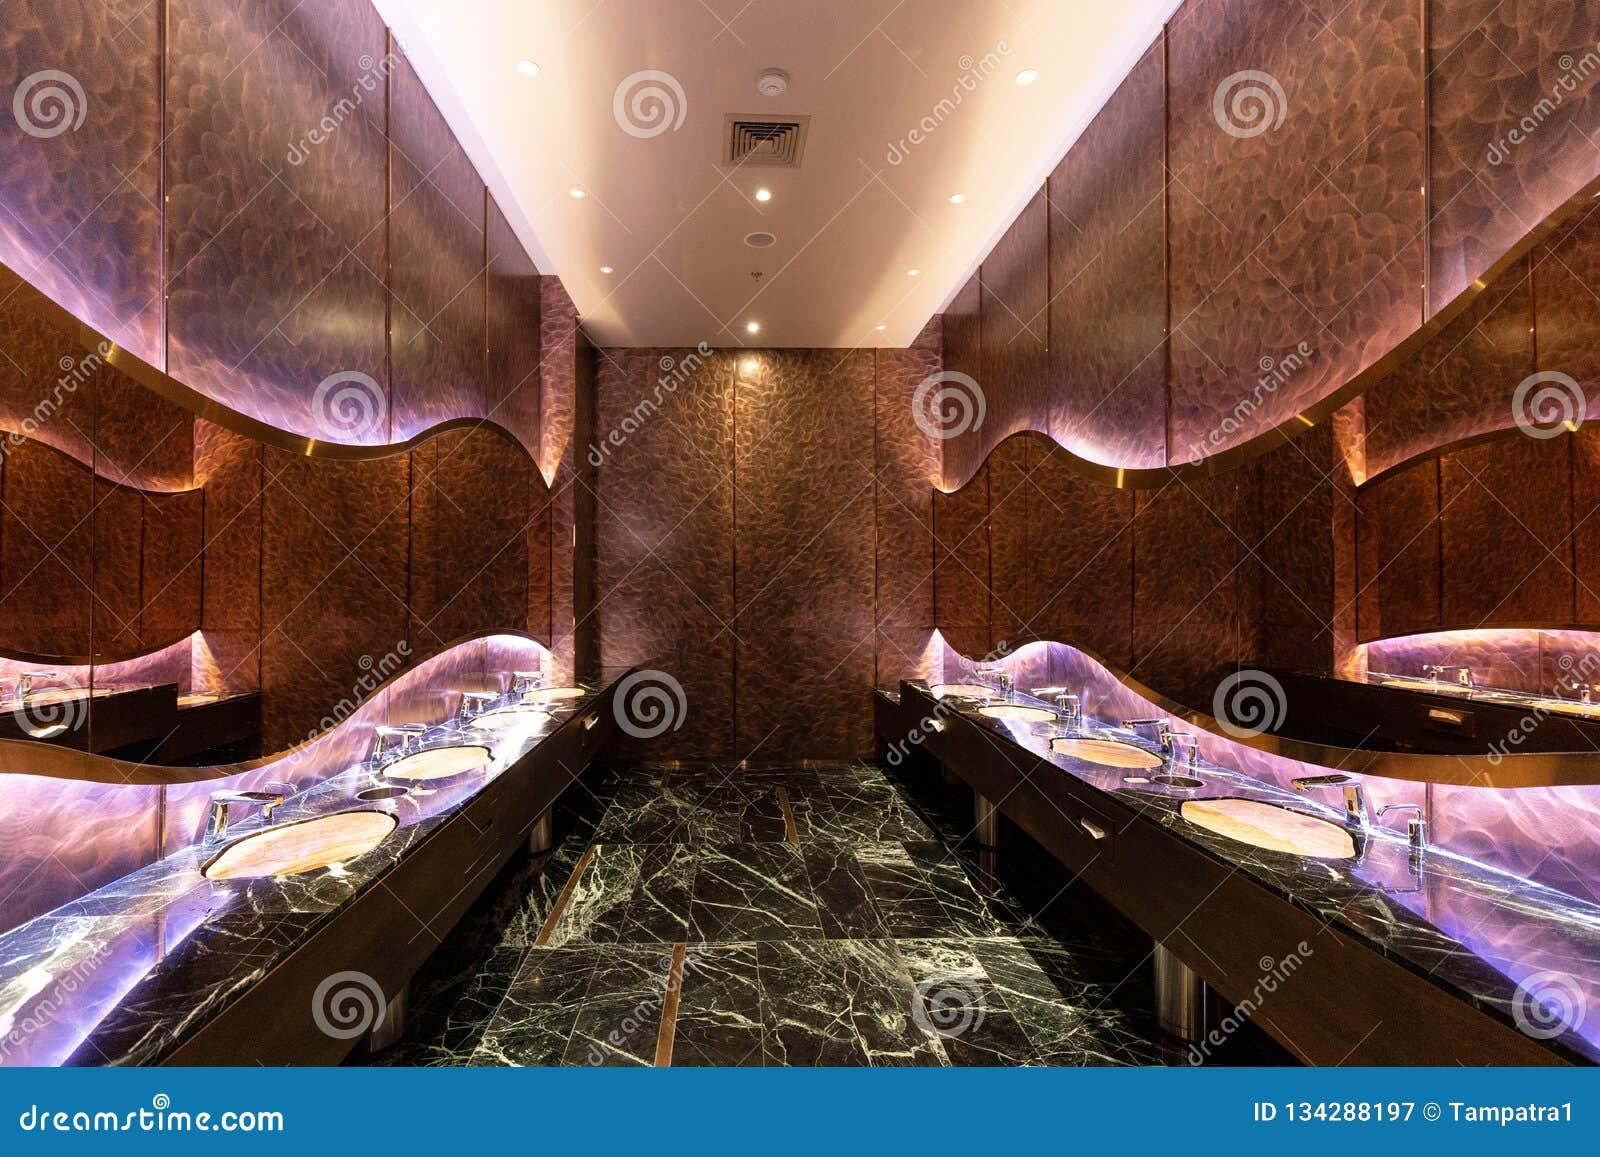 Row Of Futuristic Modern Marble Ceramic Wash Basin In ...